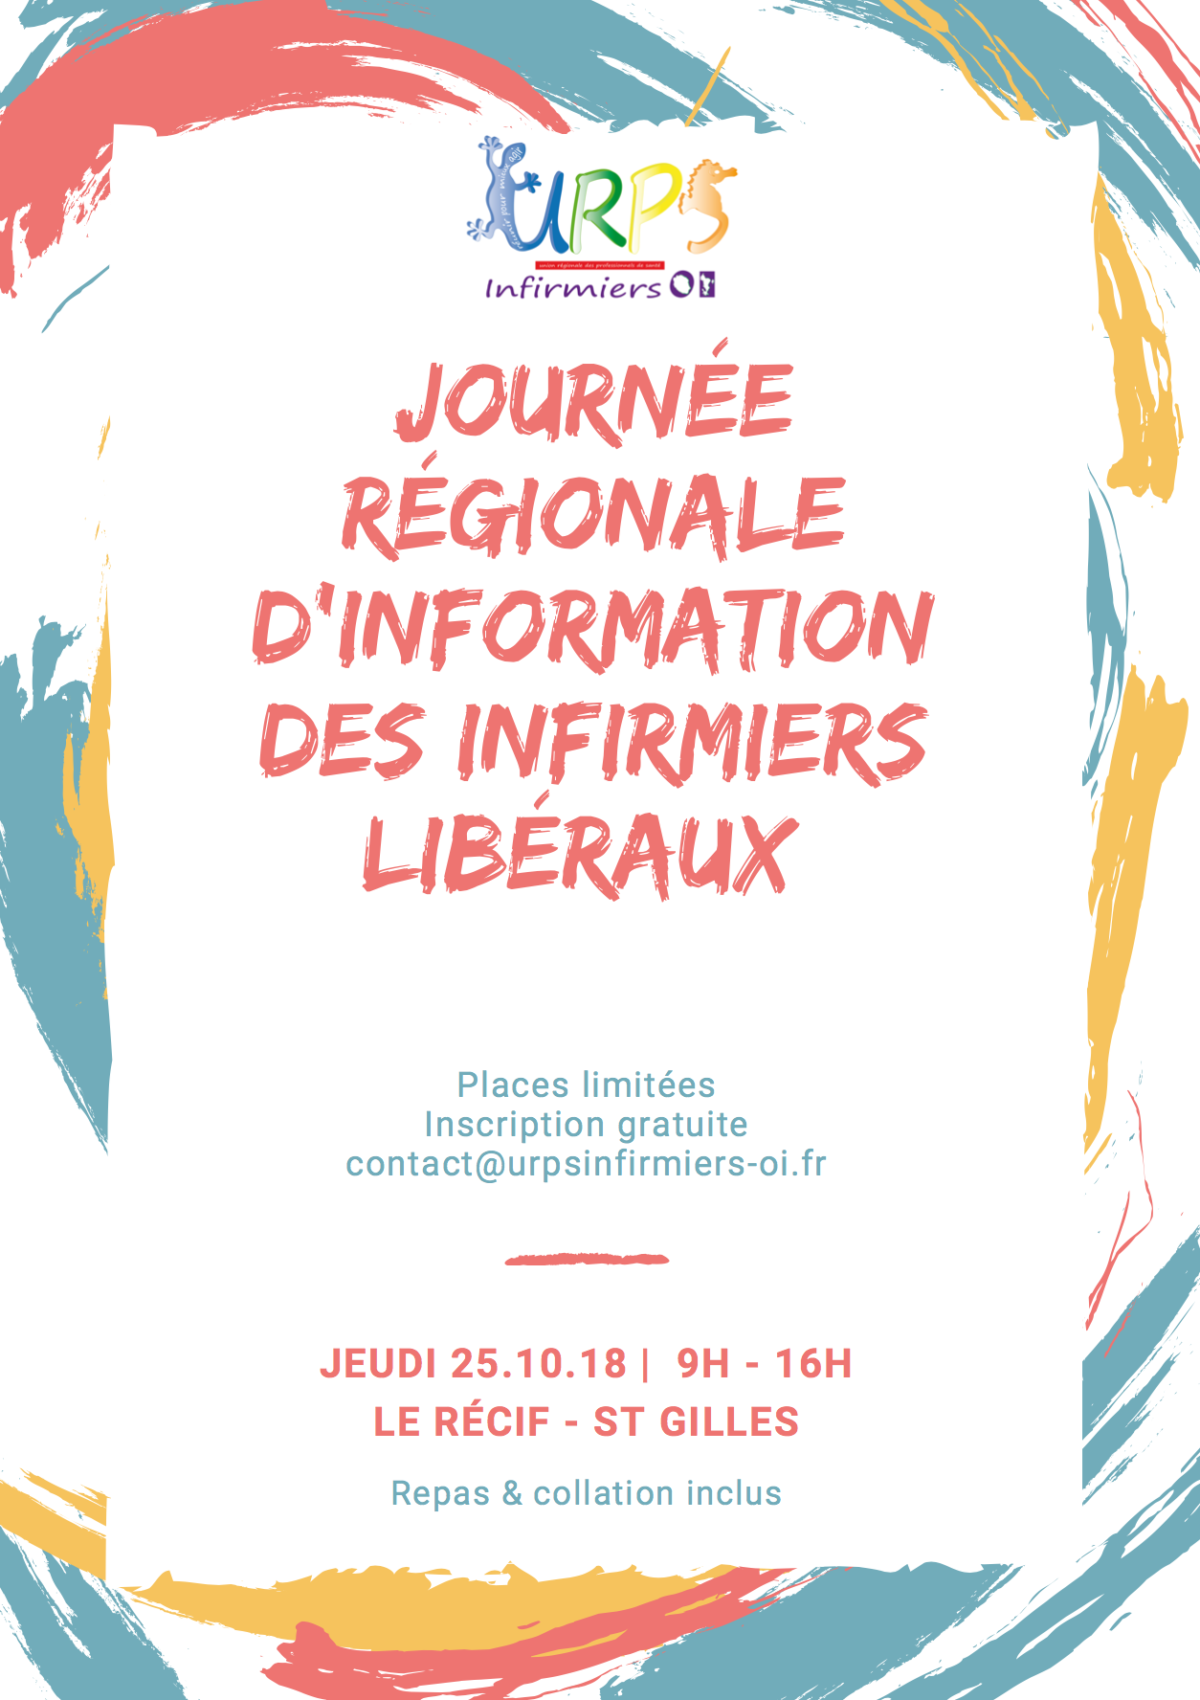 INVITATION A LA JOURNEE REGIONALE DES INFIRMIERS LIBERAUX